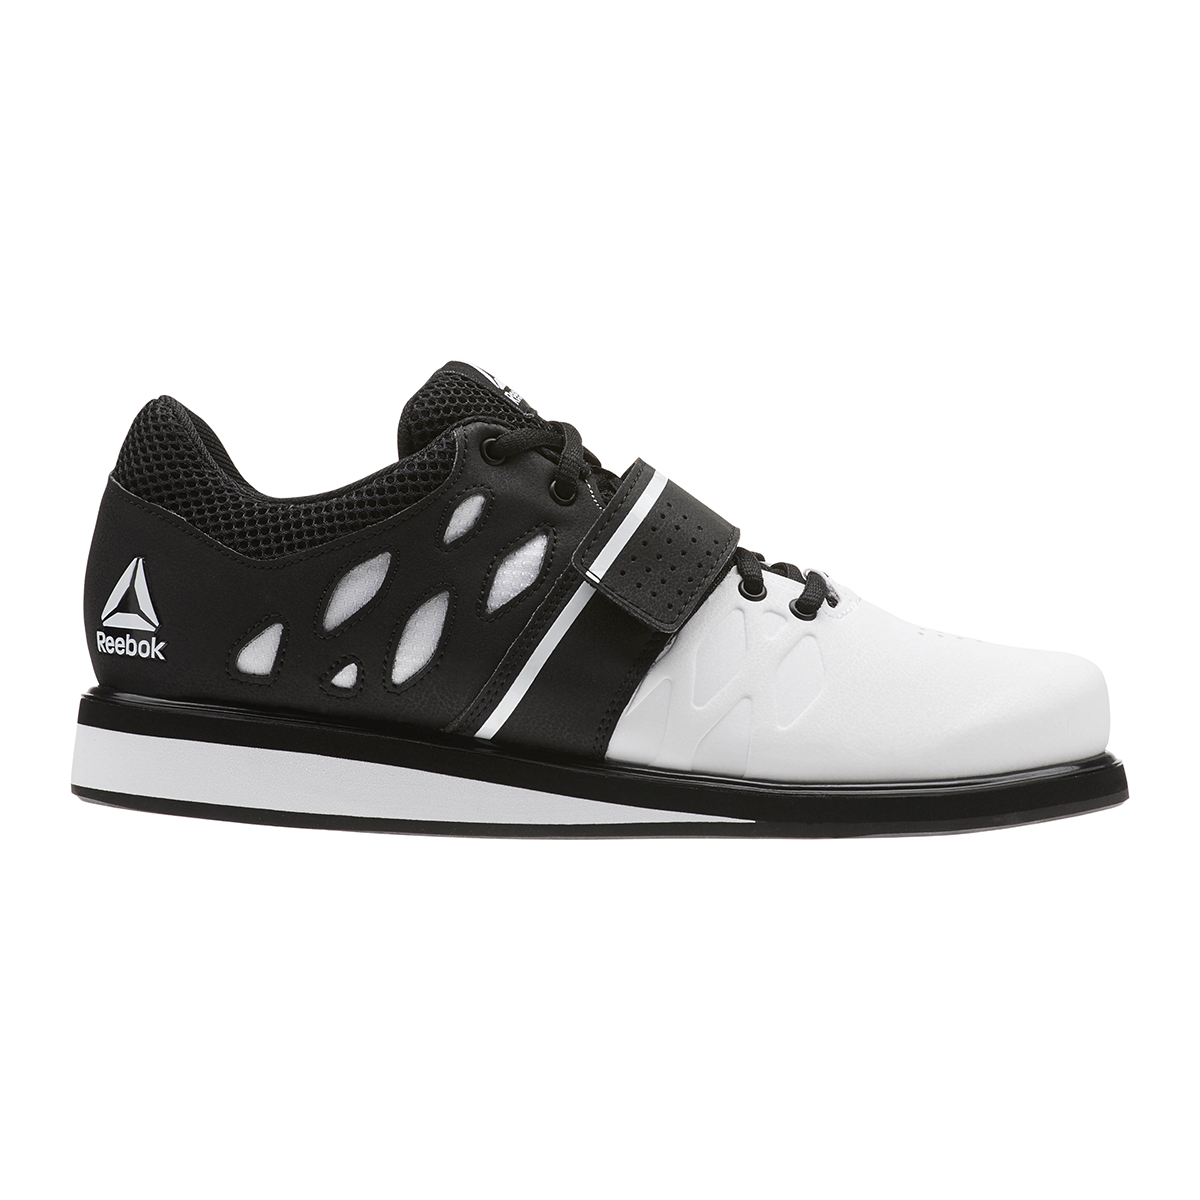 Reebok Lifter PR Training Shoes - Color: White/Black (Regular Width) - Size: 6.5, White/Black, large, image 1